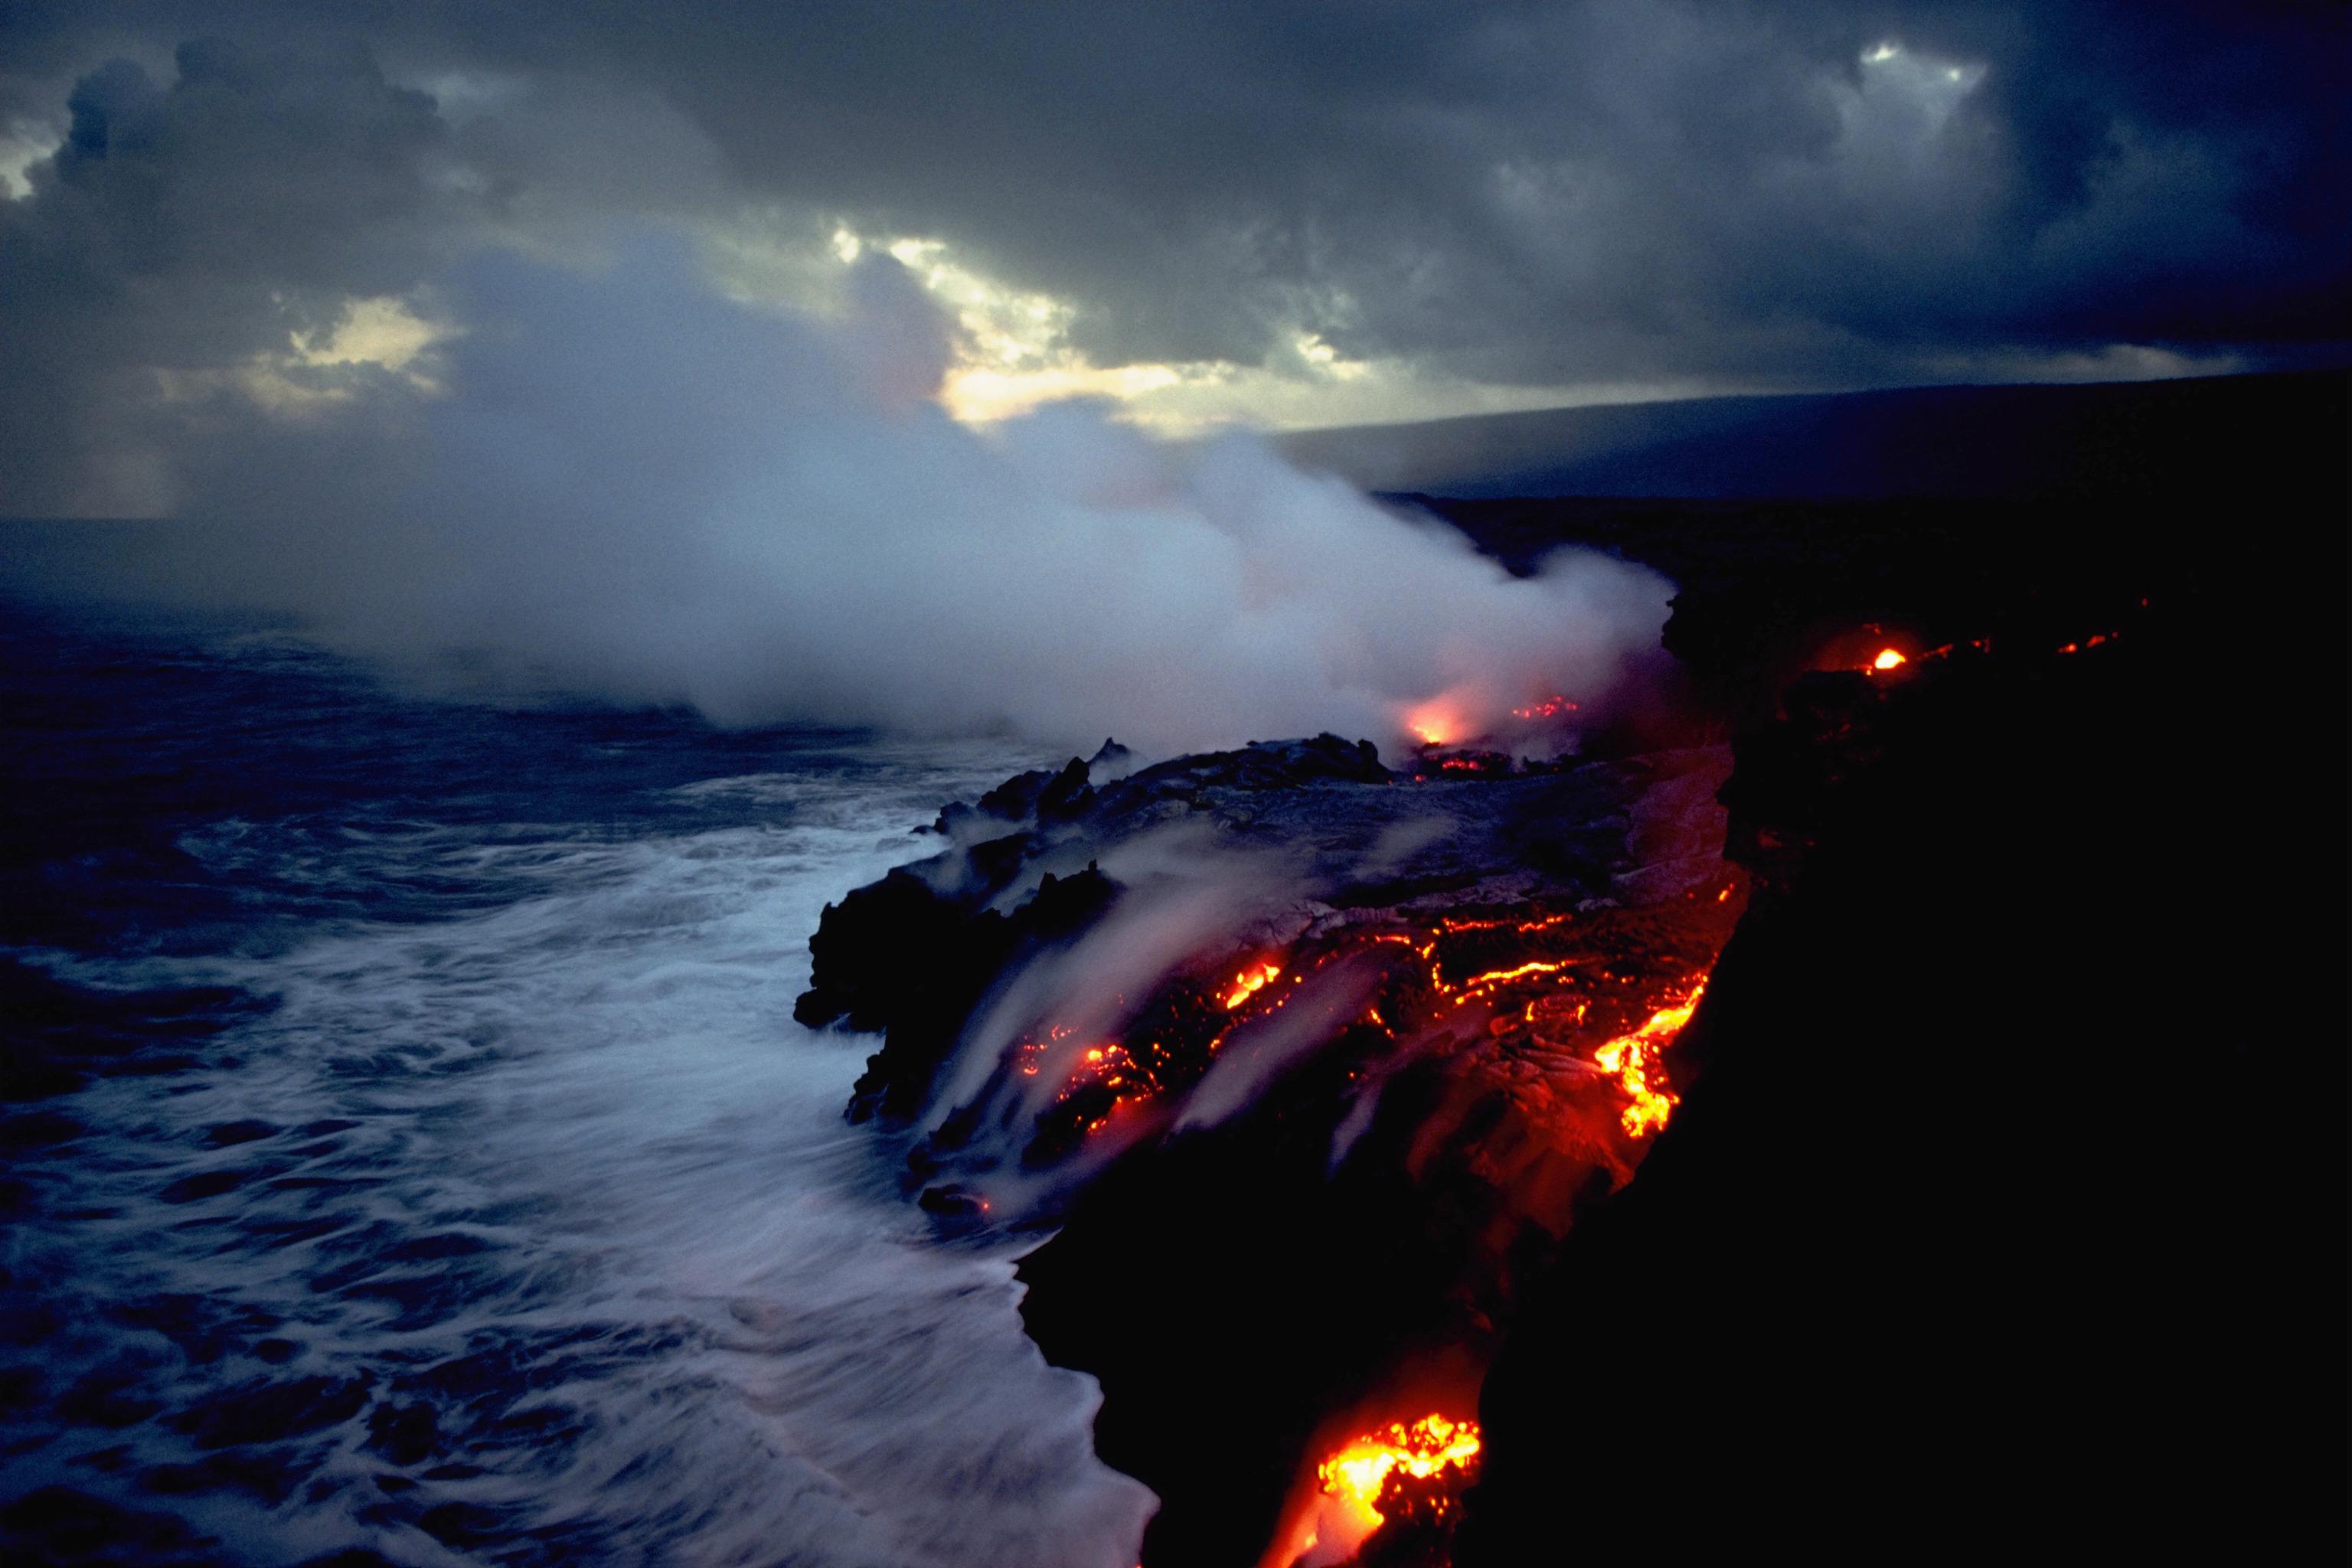 wallpaper hd volcano eruption - photo #15